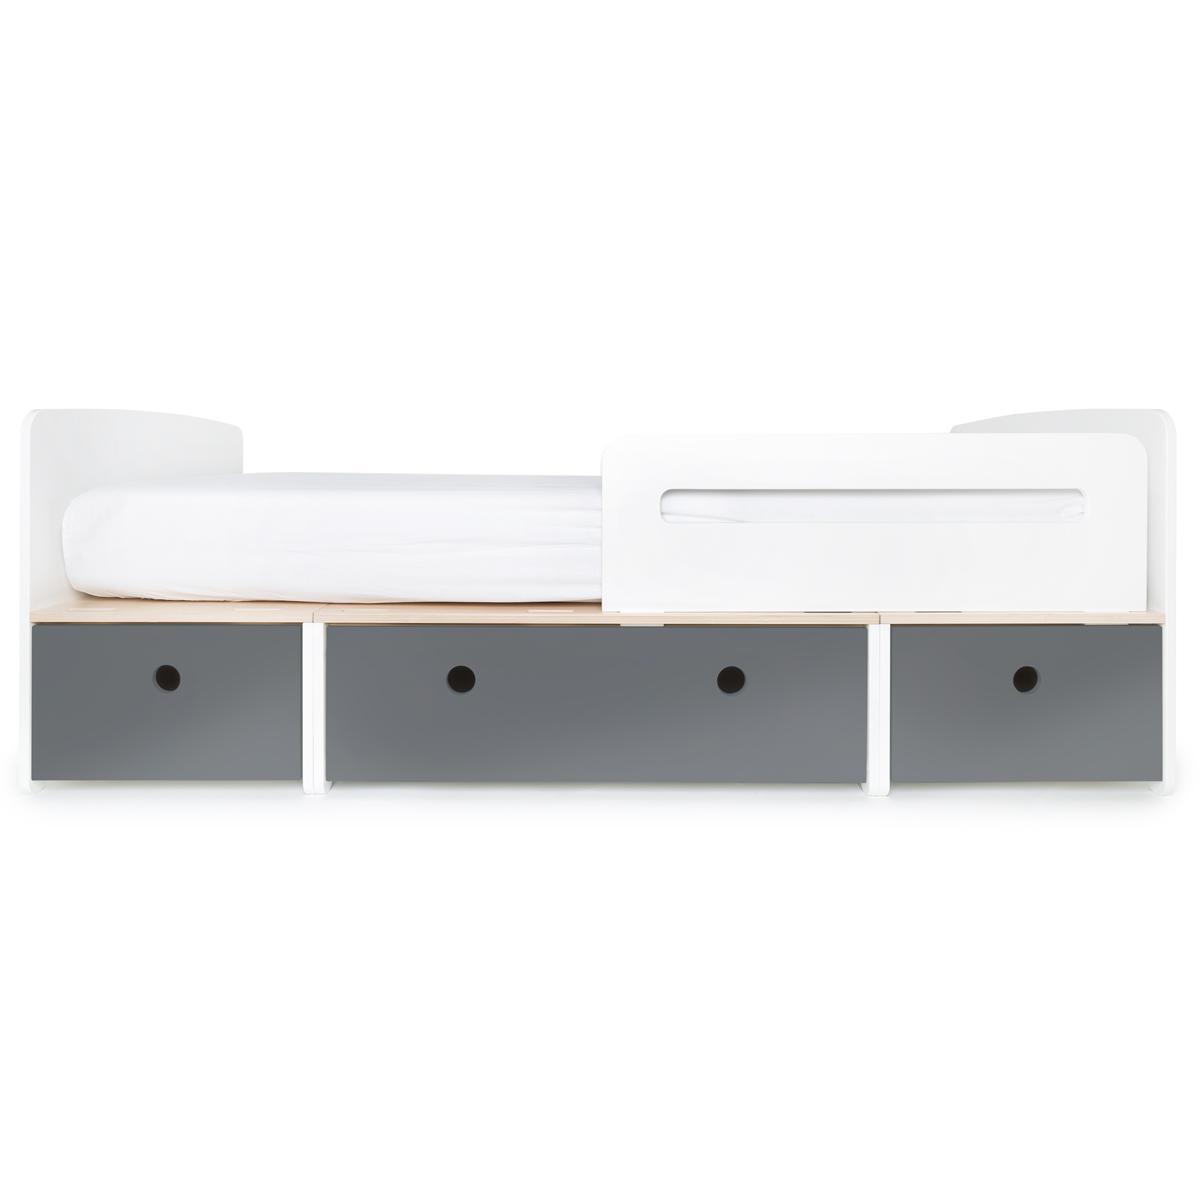 Kinderbett 90x200cm COLORFLEX space grey